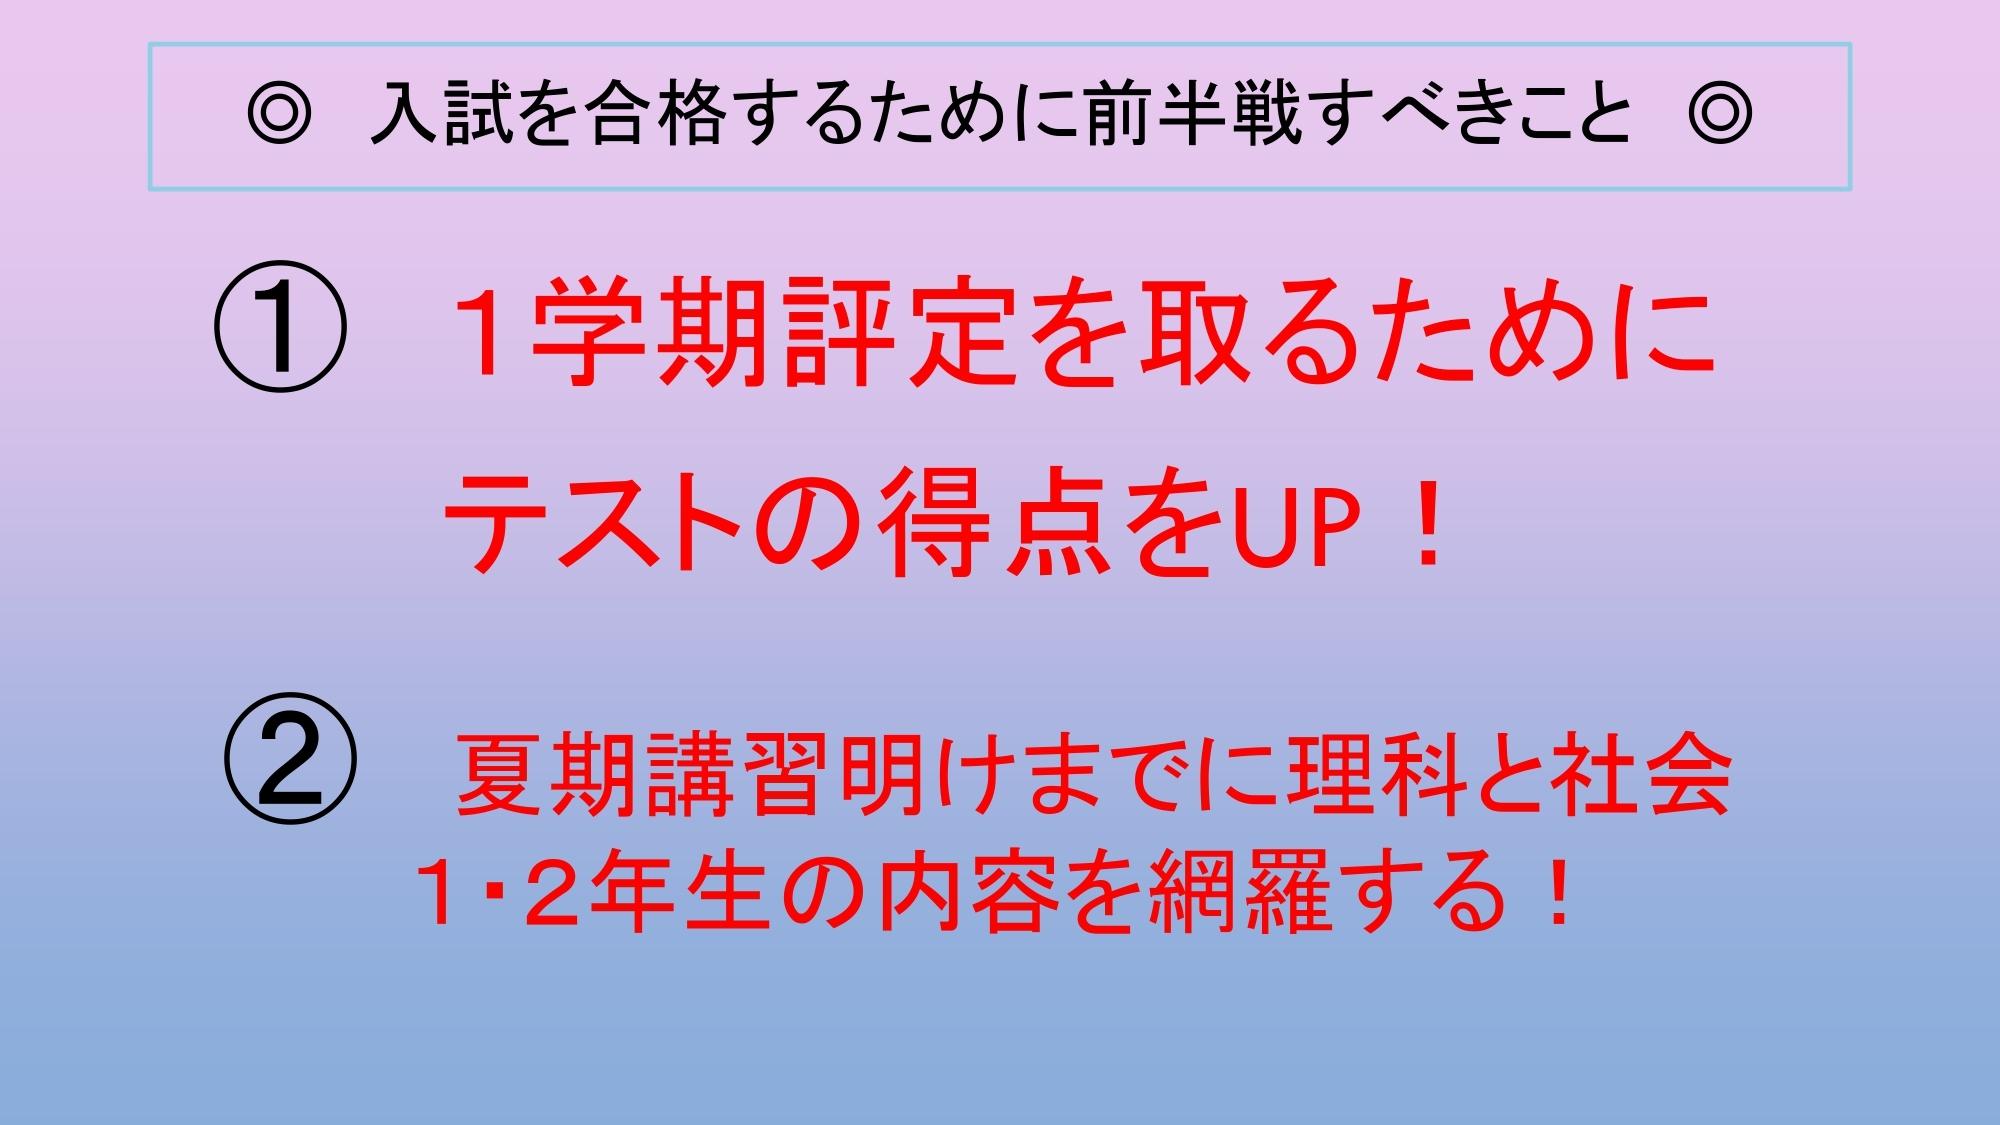 【Next Stage】山形県立高校 入試必須情報 等!